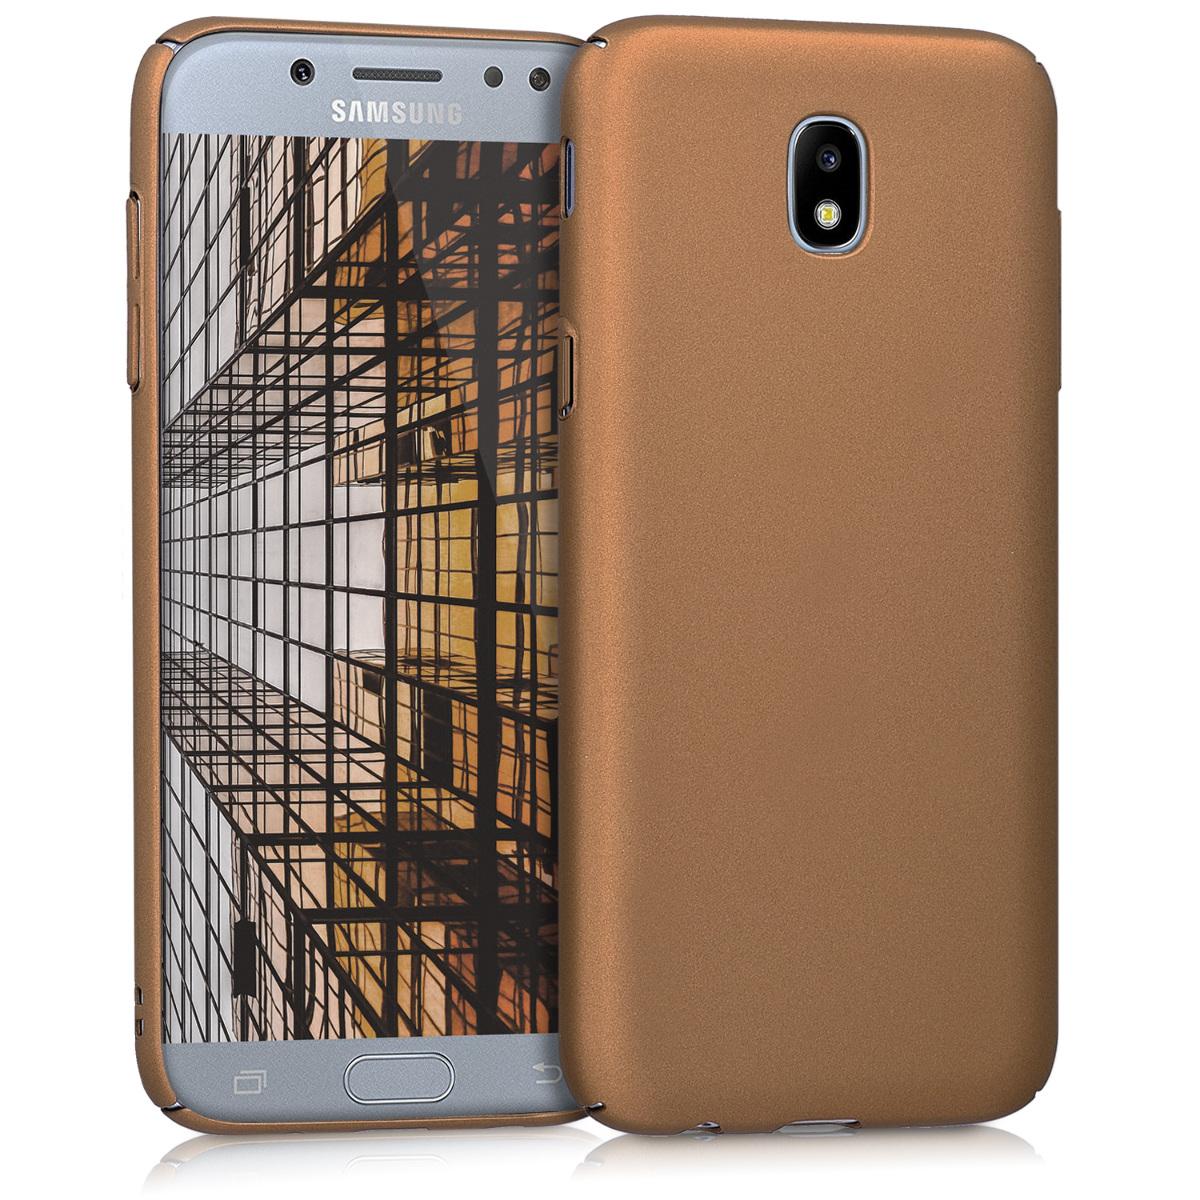 KW Slim Anti-Slip Cover - Σκληρή Θήκη Καουτσούκ Samsung Galaxy J5 (2017) - Καφέ μεταλλικό (42761.27)